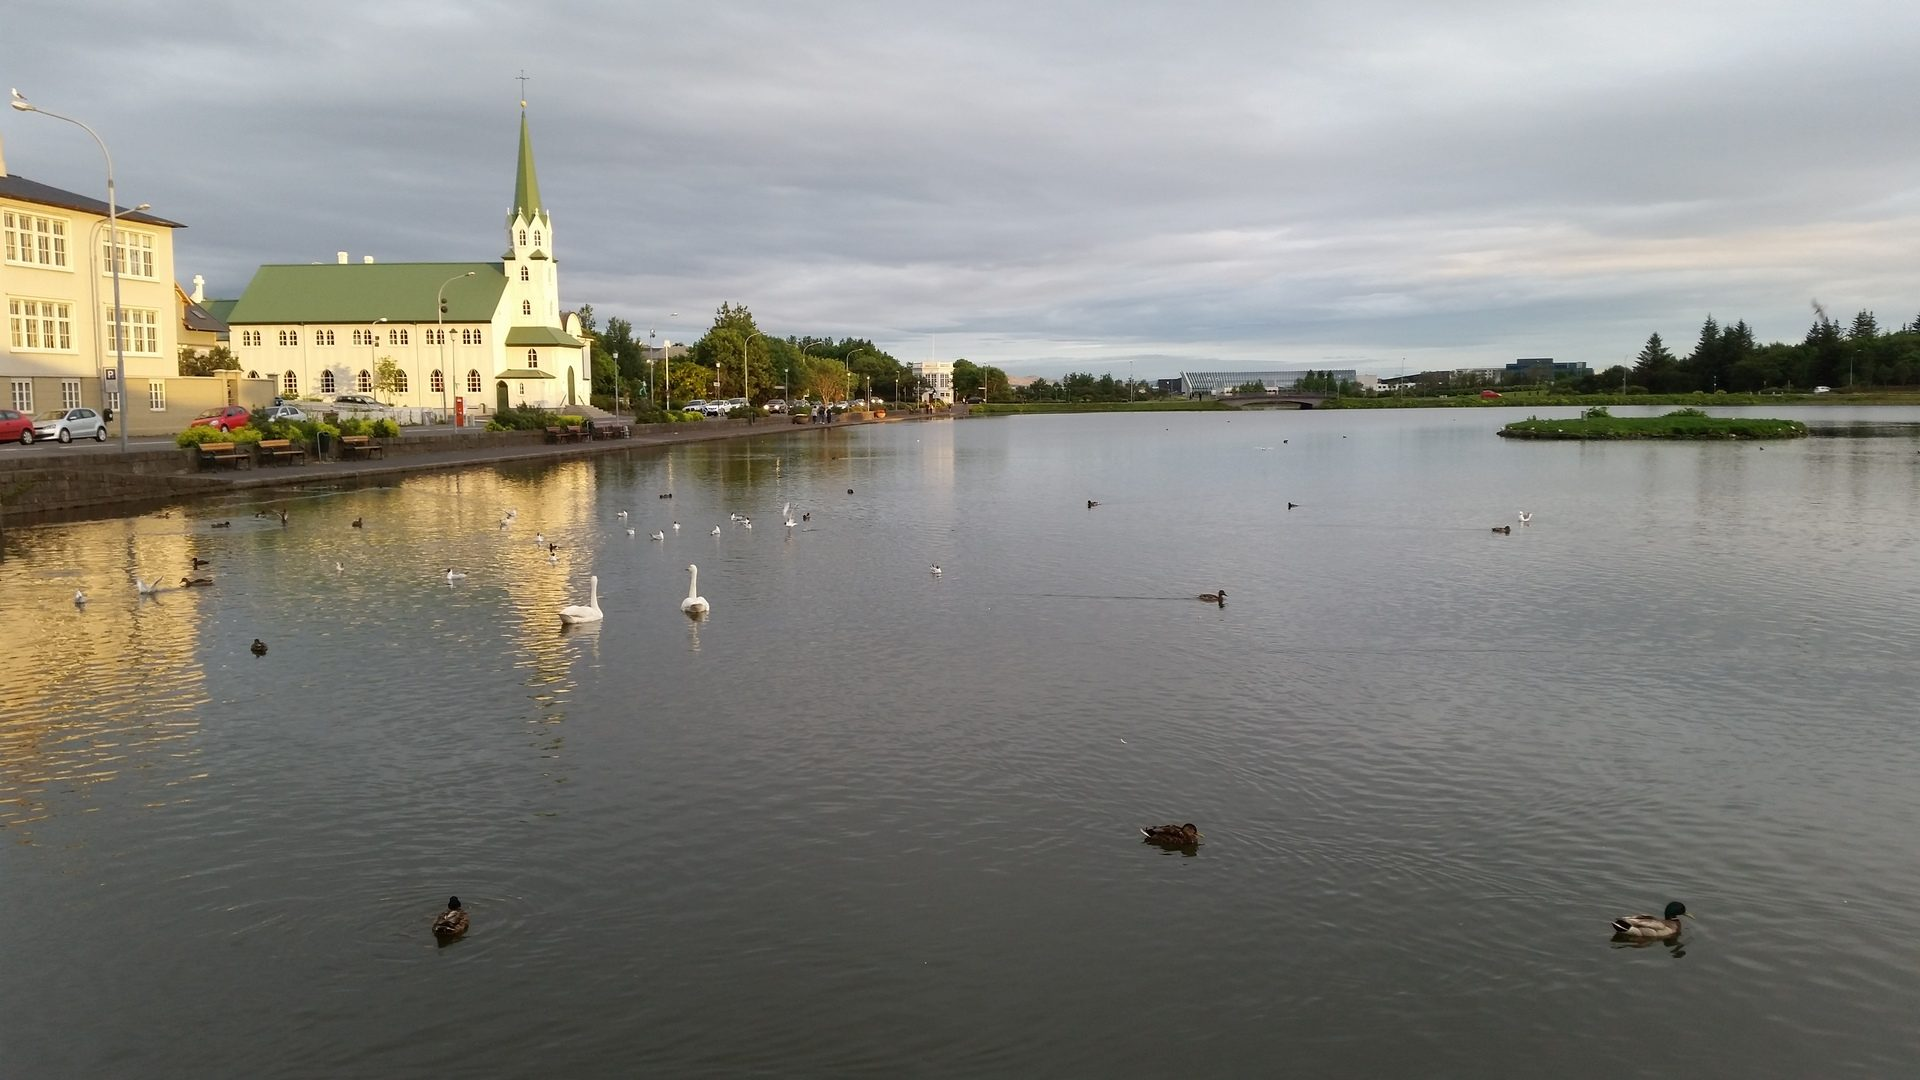 15 juillet : de Geysir à Reykjavik